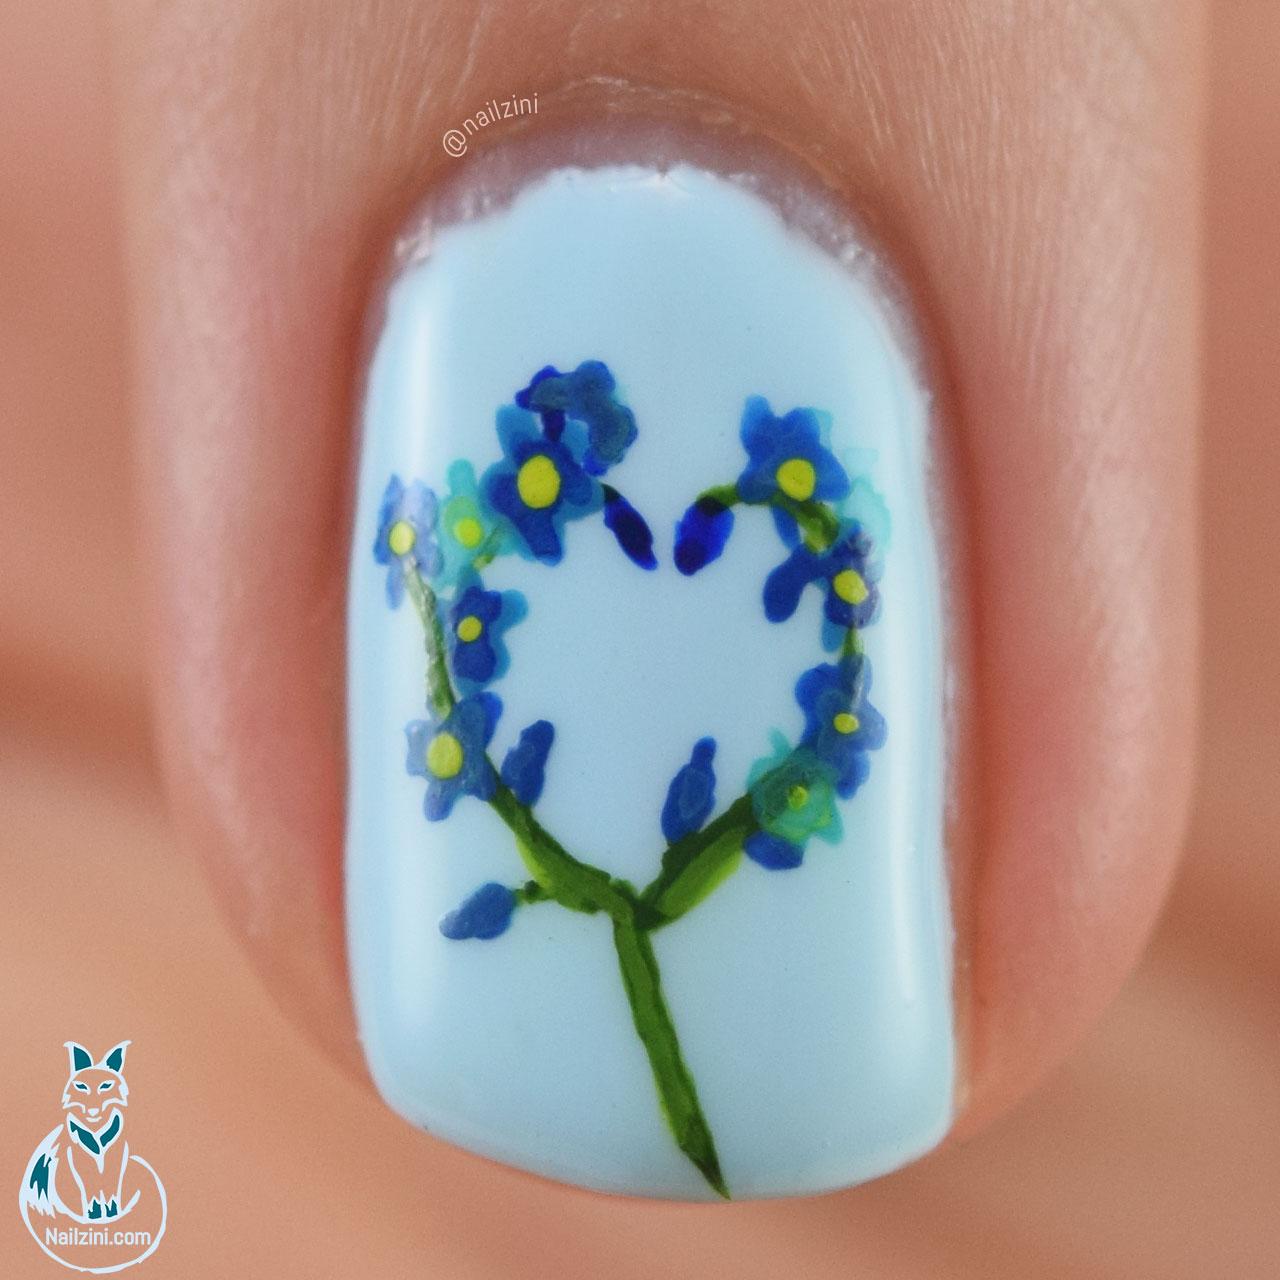 Amor Azul Madam Glam Nailzini